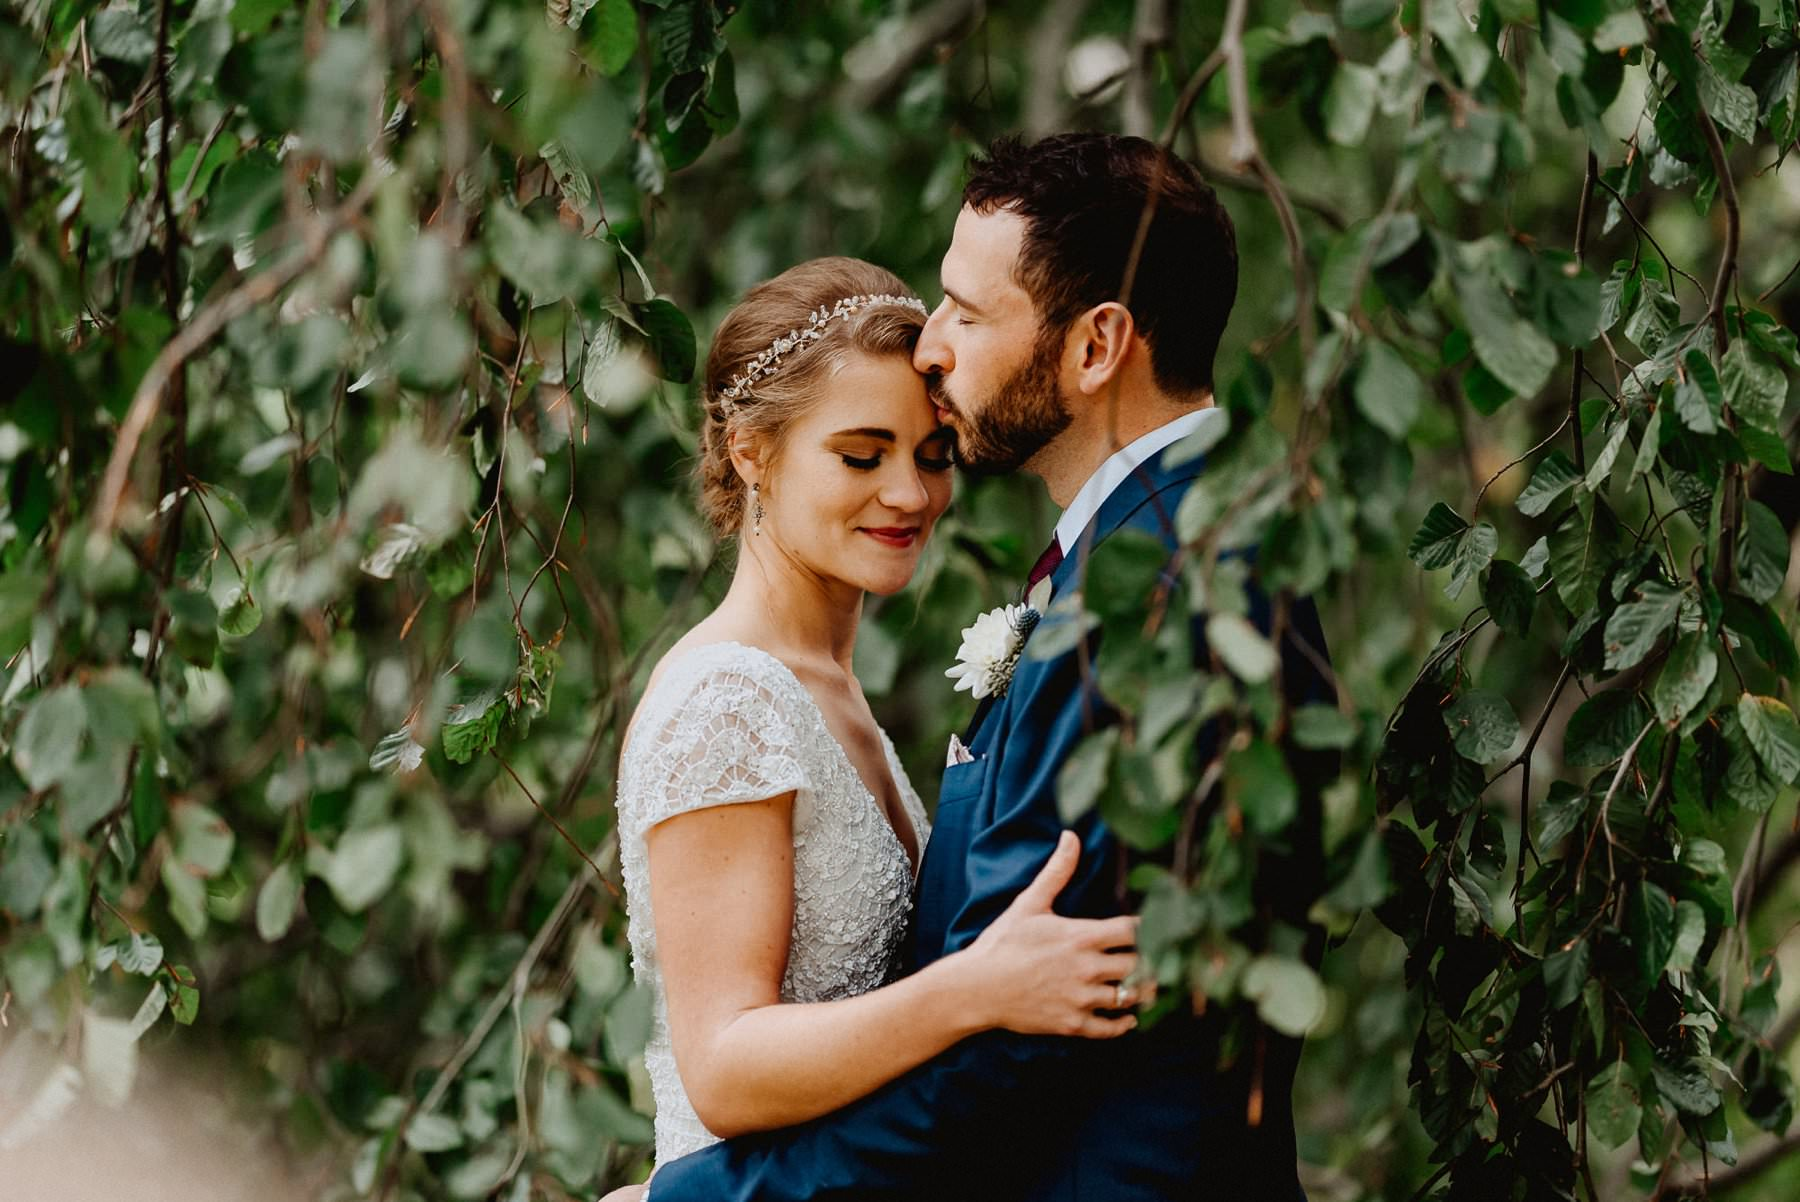 John_James_Audubon_Center_wedding-29.jpg